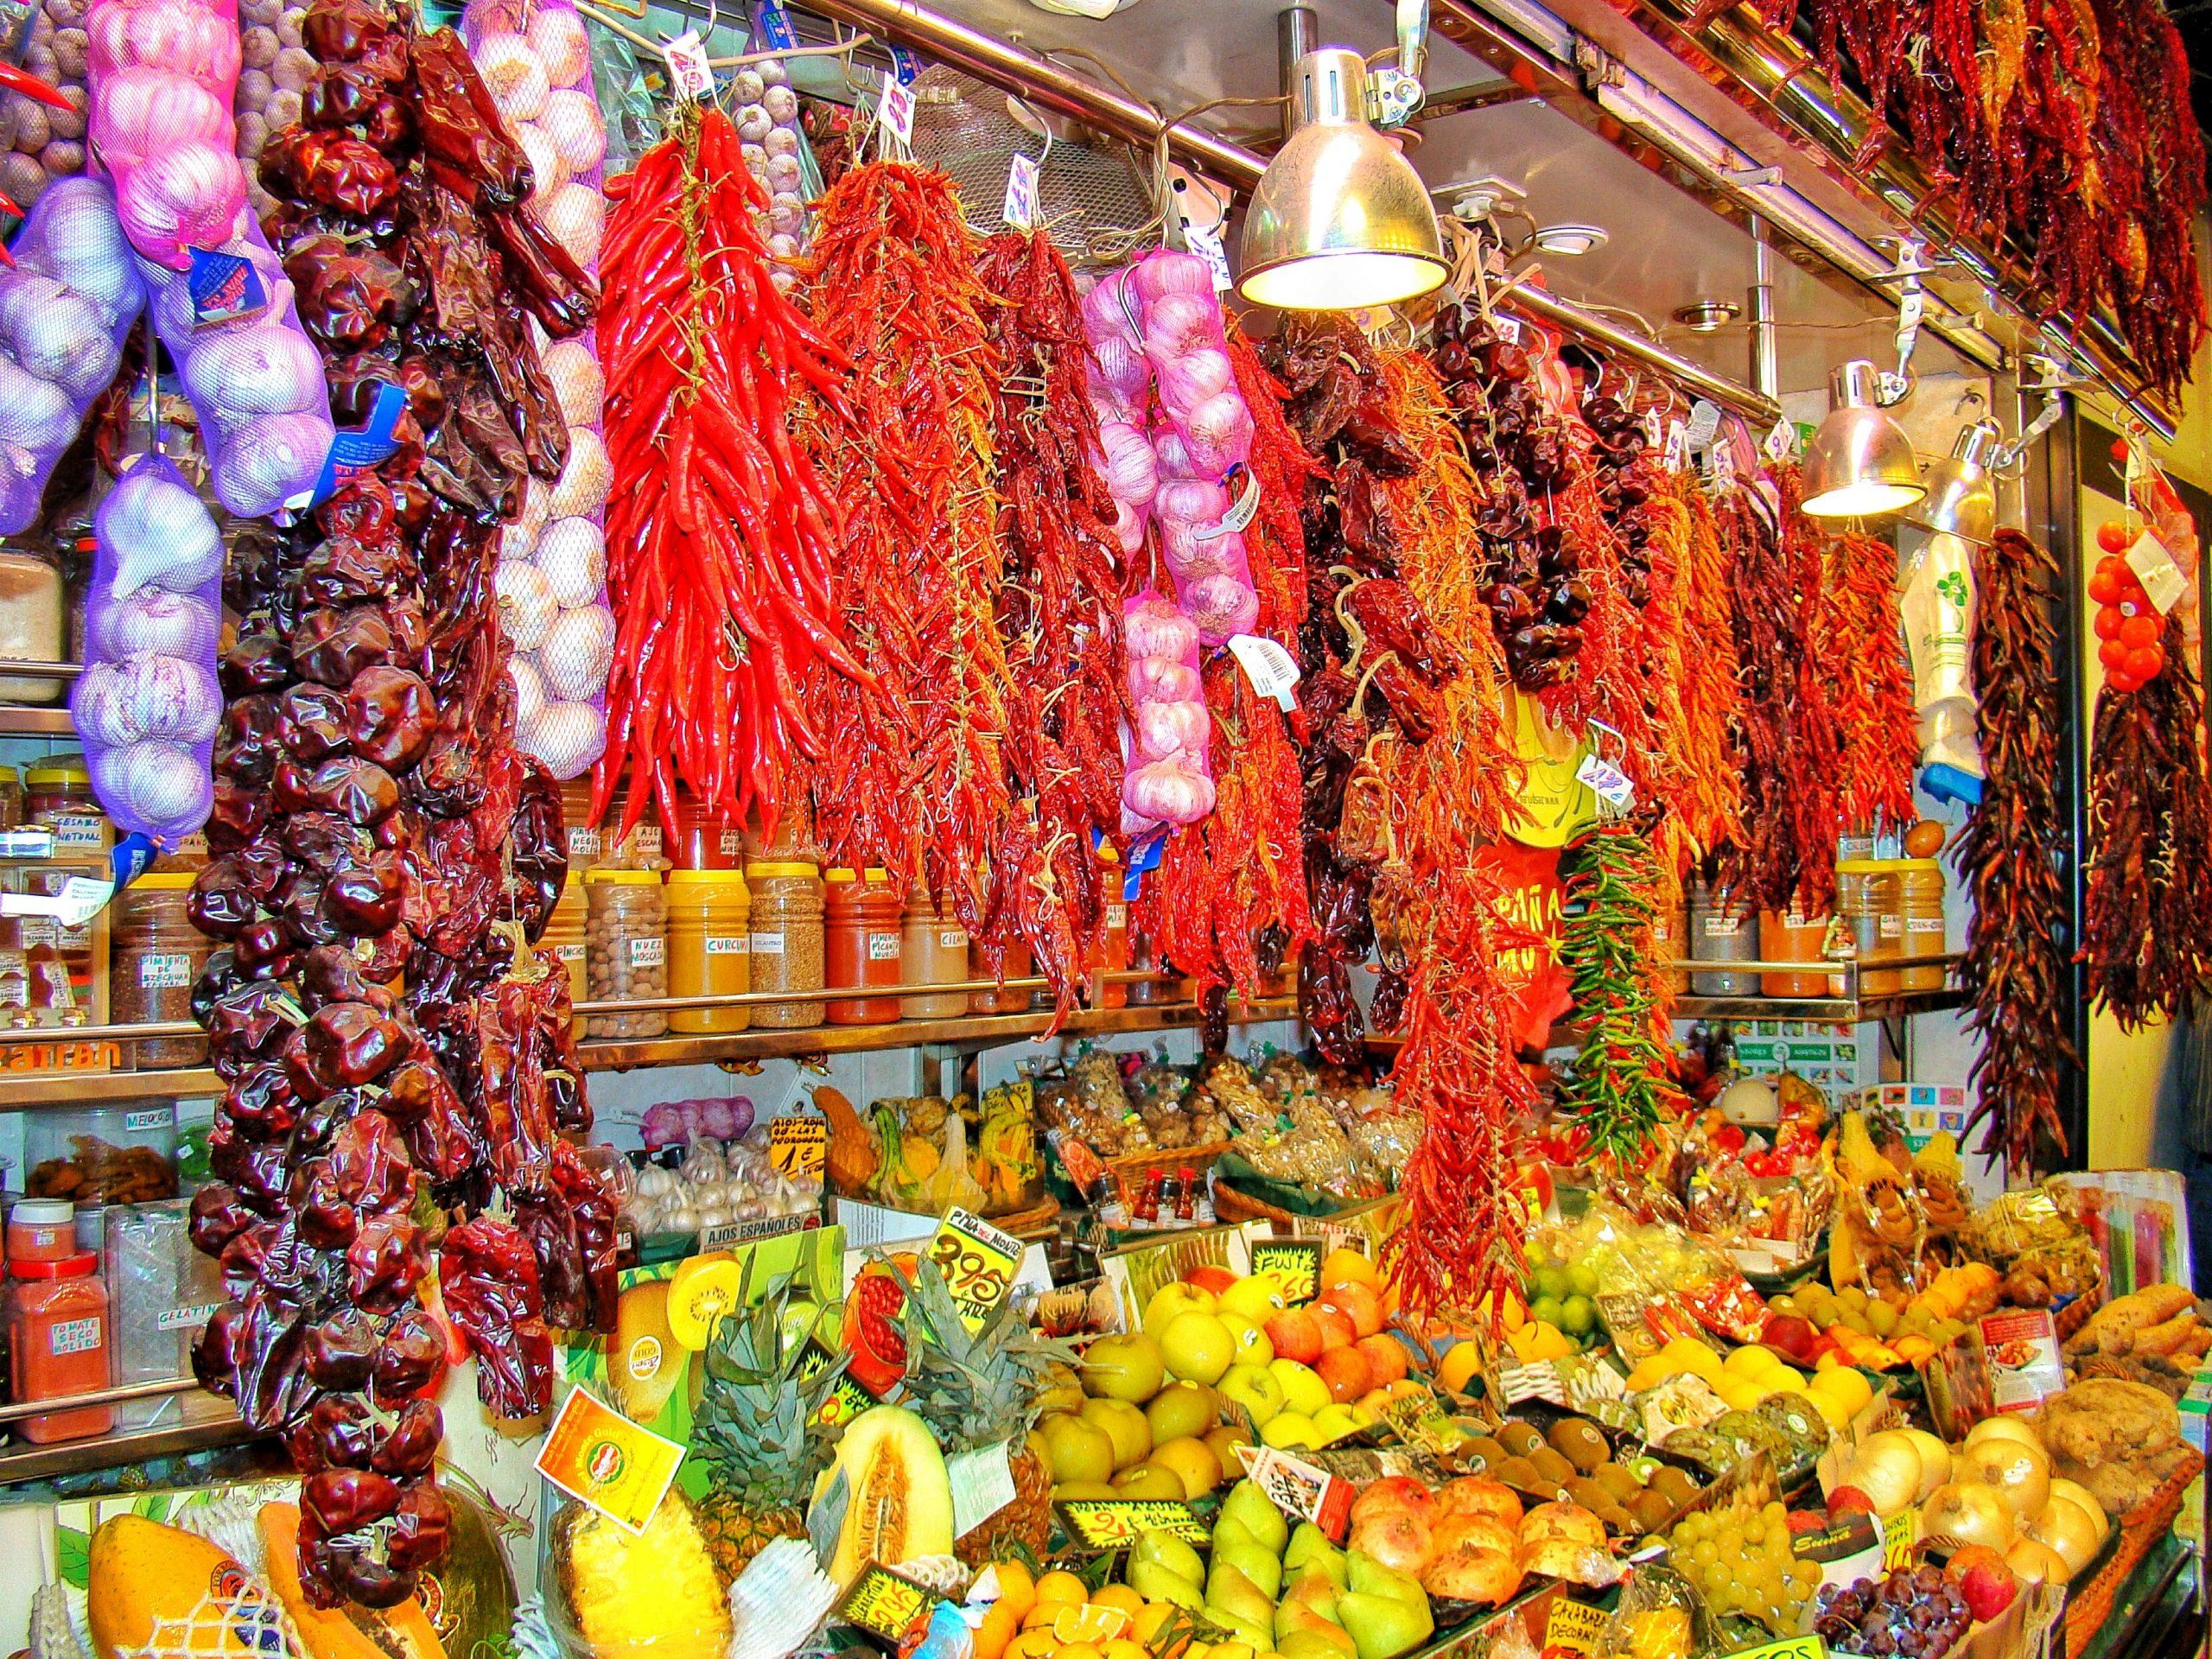 Market-de-la-Boqueria-Barcelona